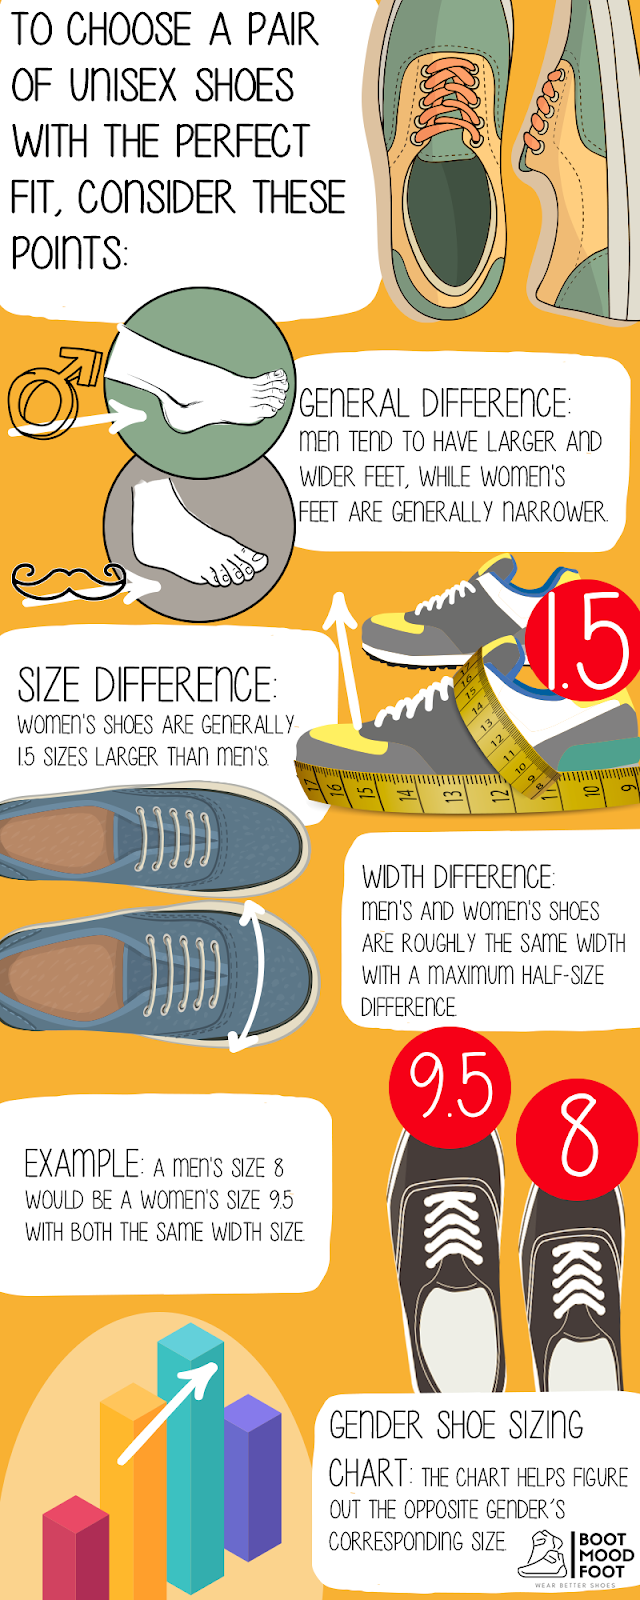 pair of unisex shoes